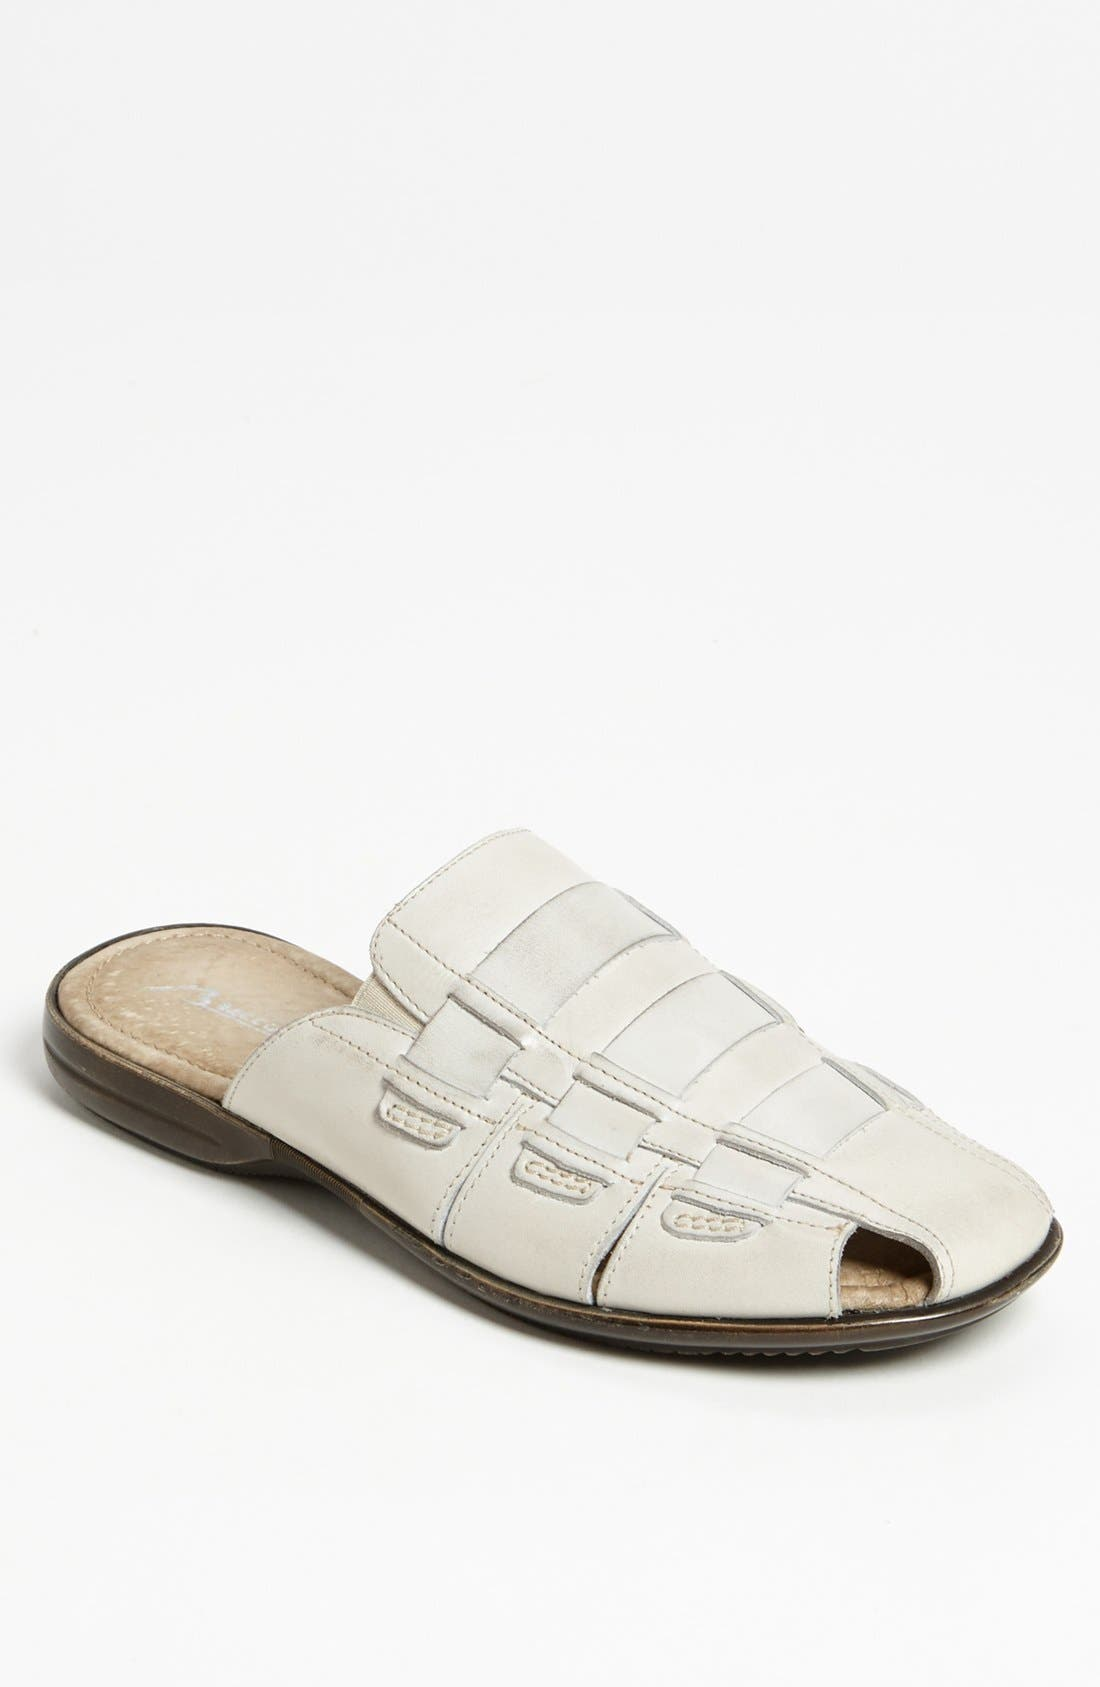 Main Image - Bacco Bucci 'Ruggeri' Sandal (Men)